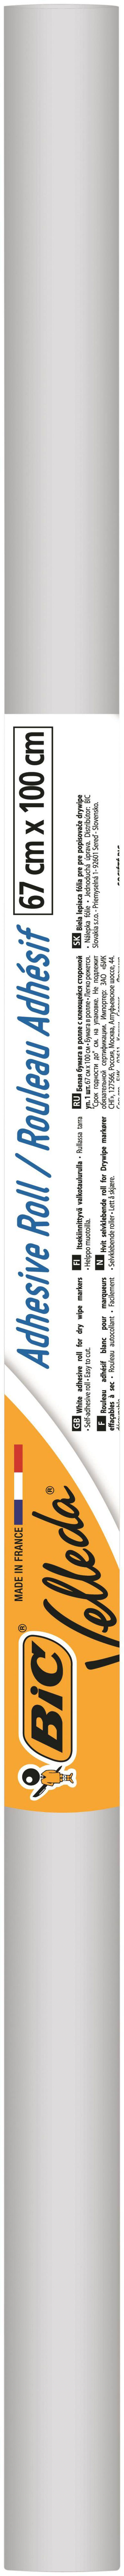 Bic Velleda Adhesive Whiteboard Roll 670 x 1000mm 870493